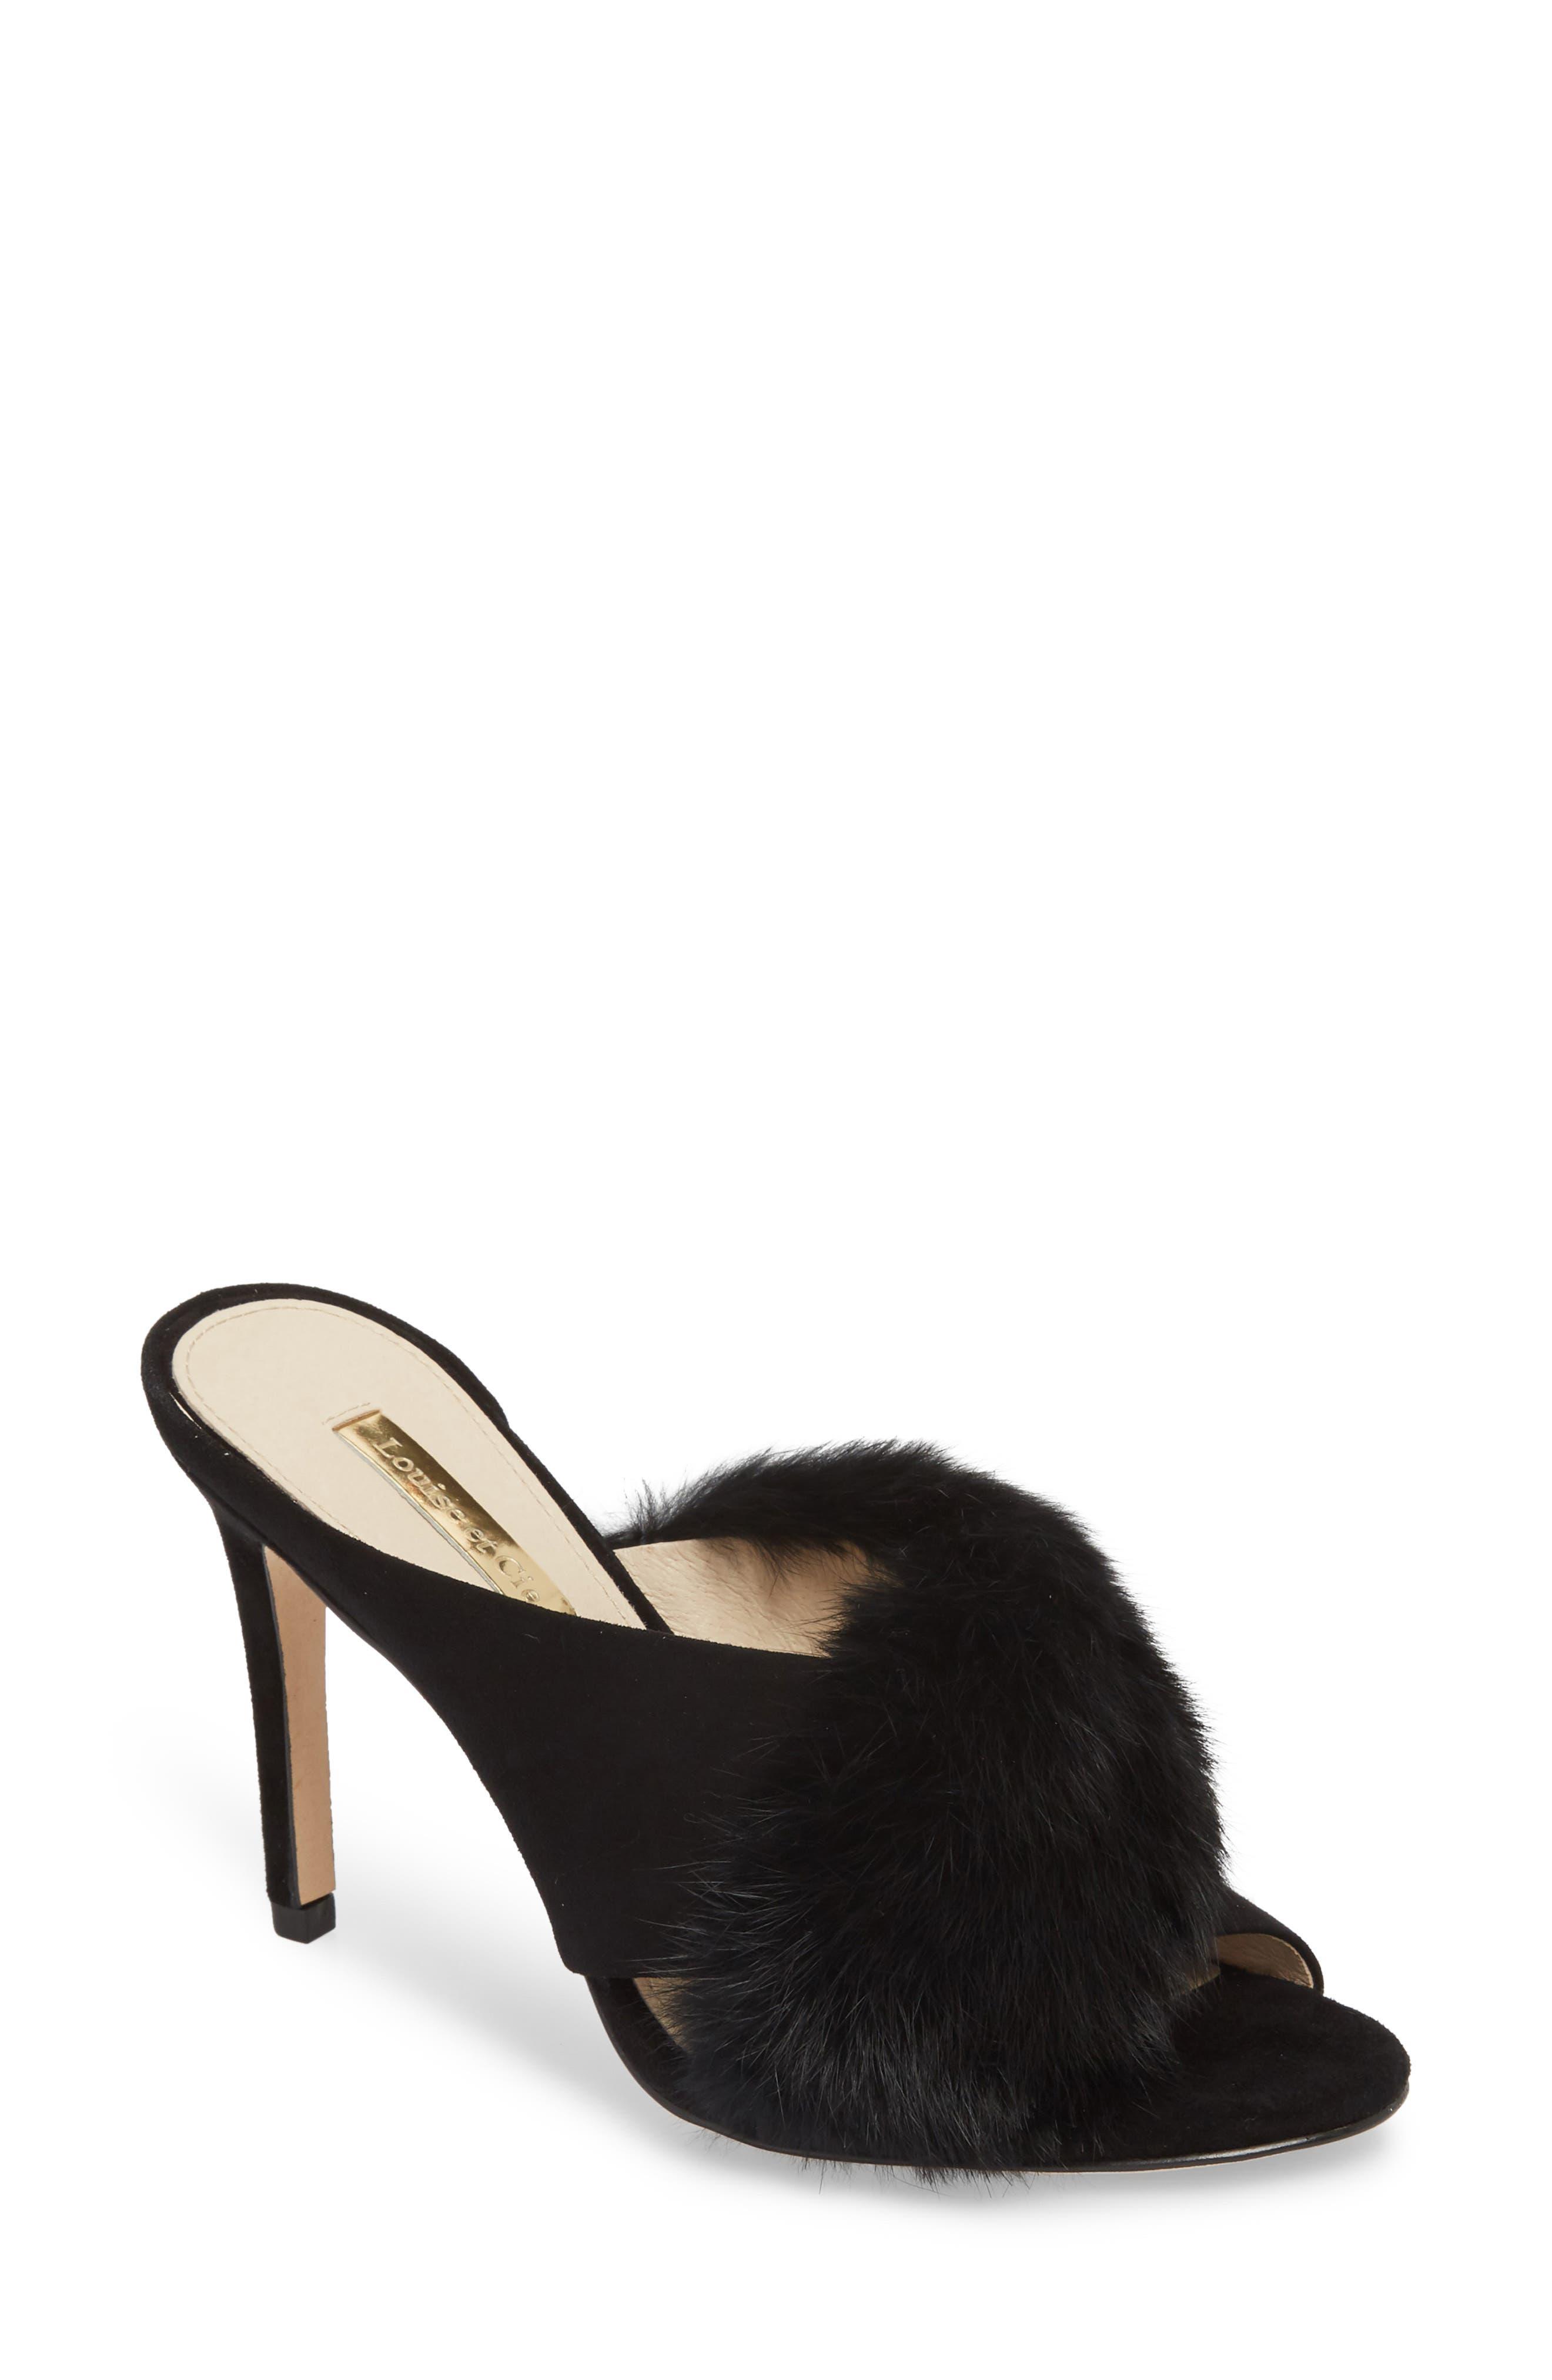 Halloway Genuine Rabbit Fur Sandal,                         Main,                         color, BLACK RABBIT FUR